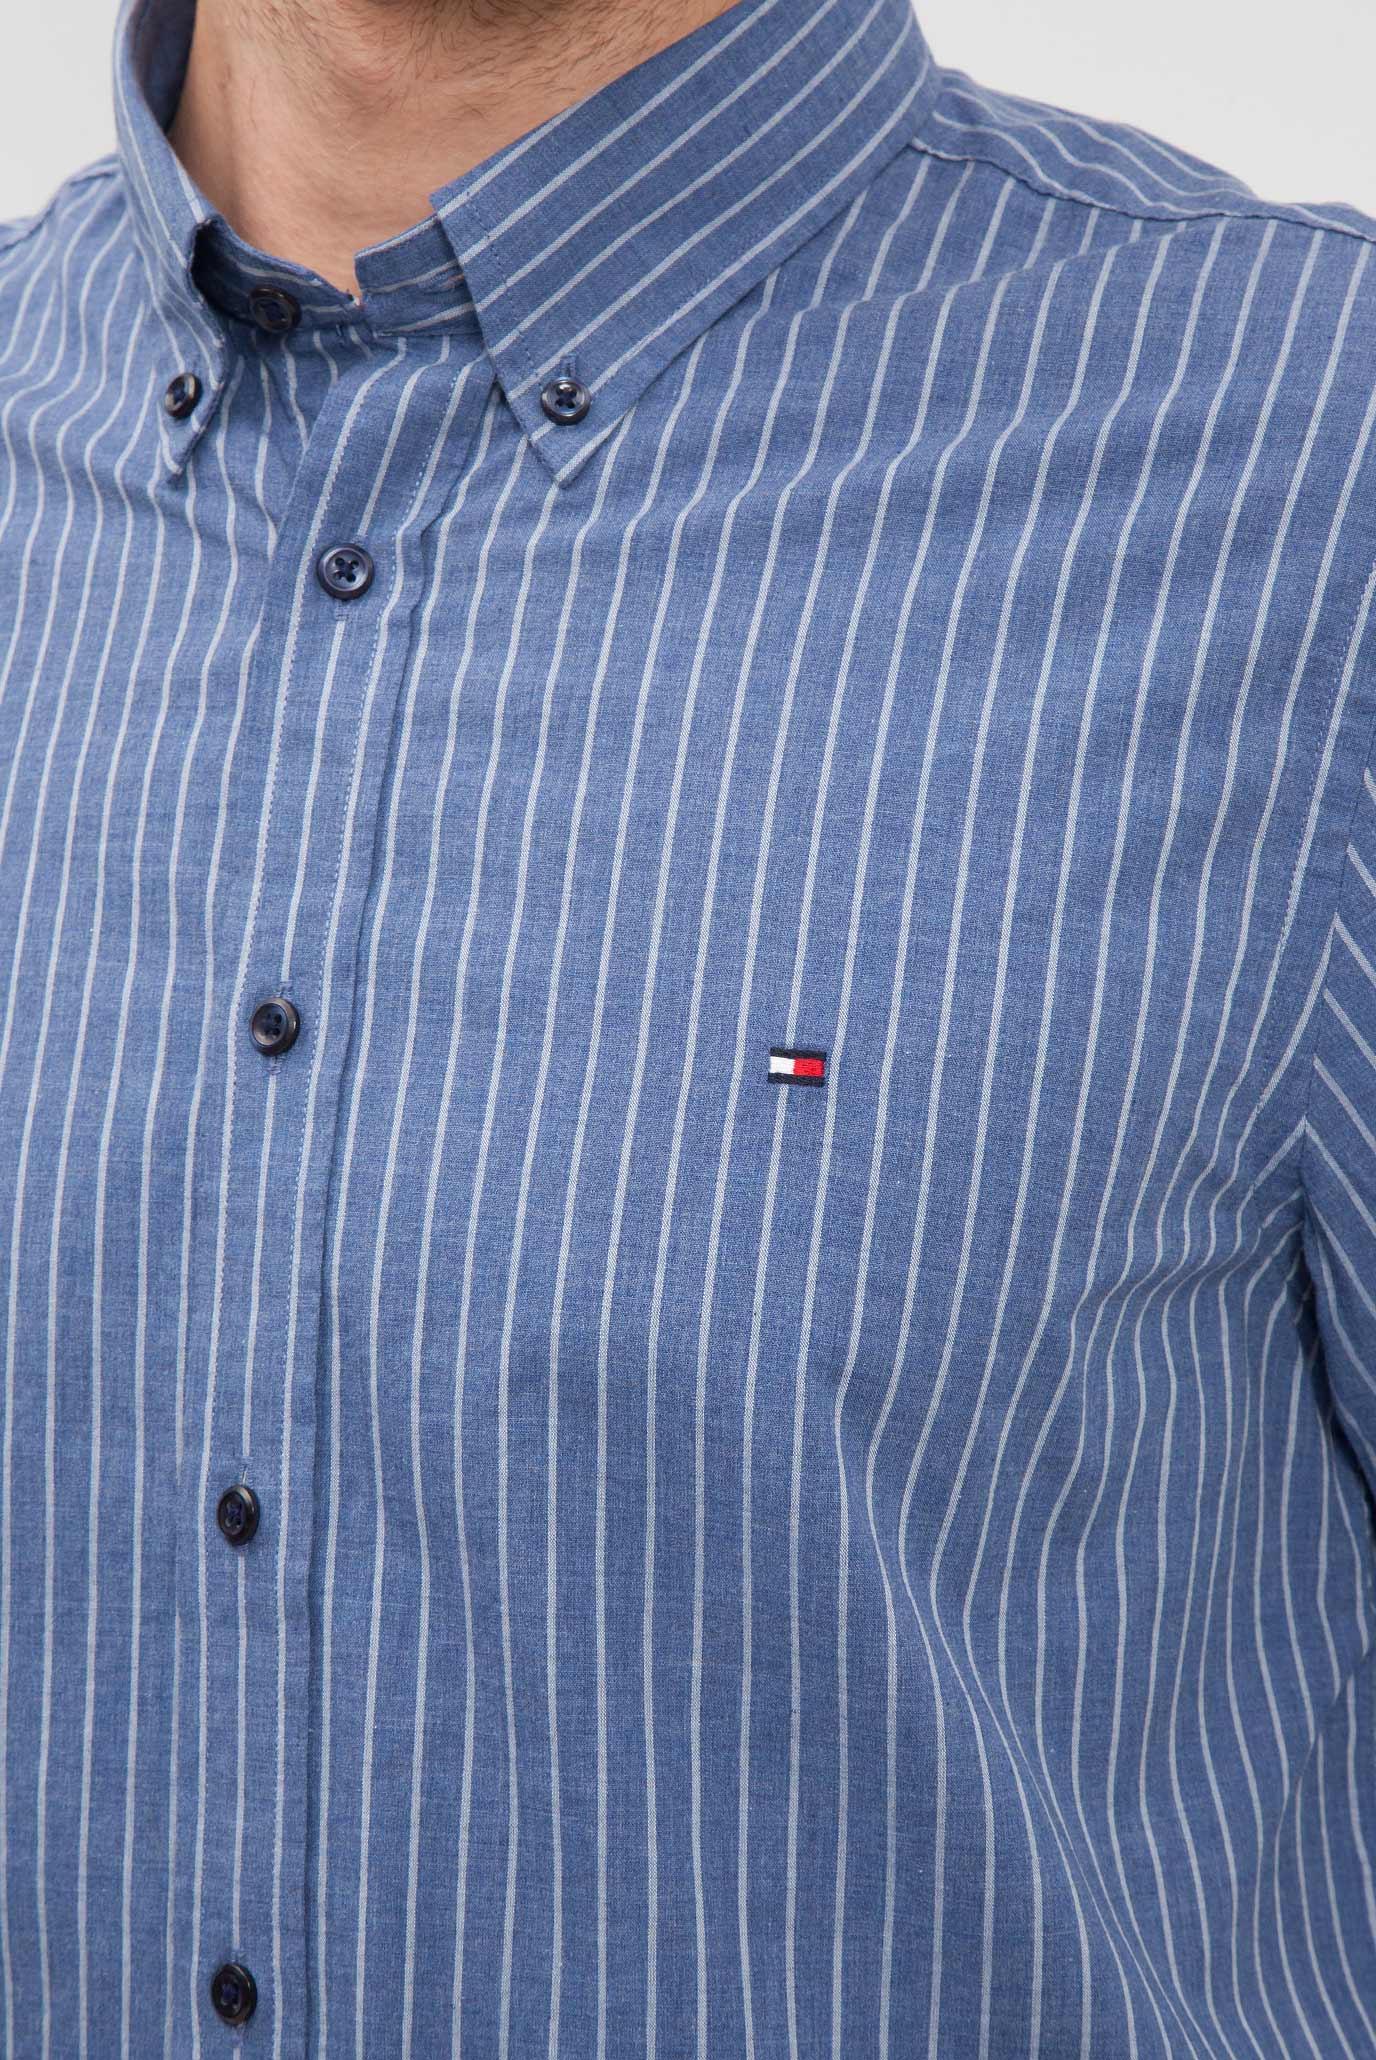 c14765f98c6 Купить Мужская синяя рубашка в полоску Tommy Hilfiger Tommy Hilfiger  MW0MW02936 – Киев